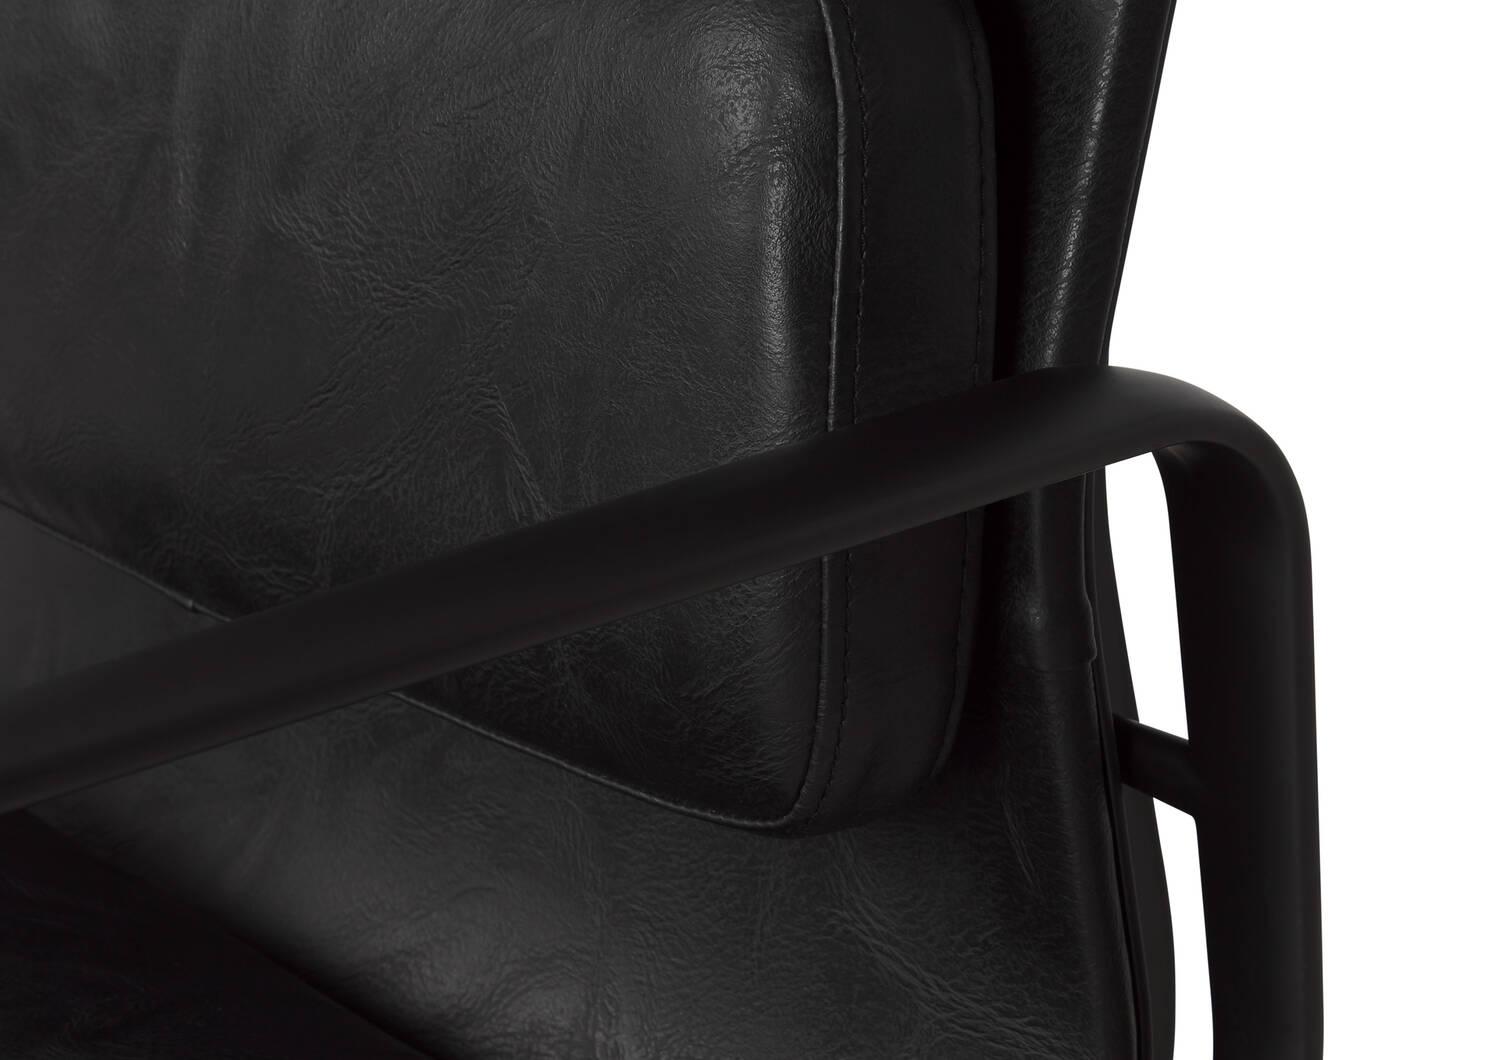 Fauteuil de bureau Handler -Wyeth noir